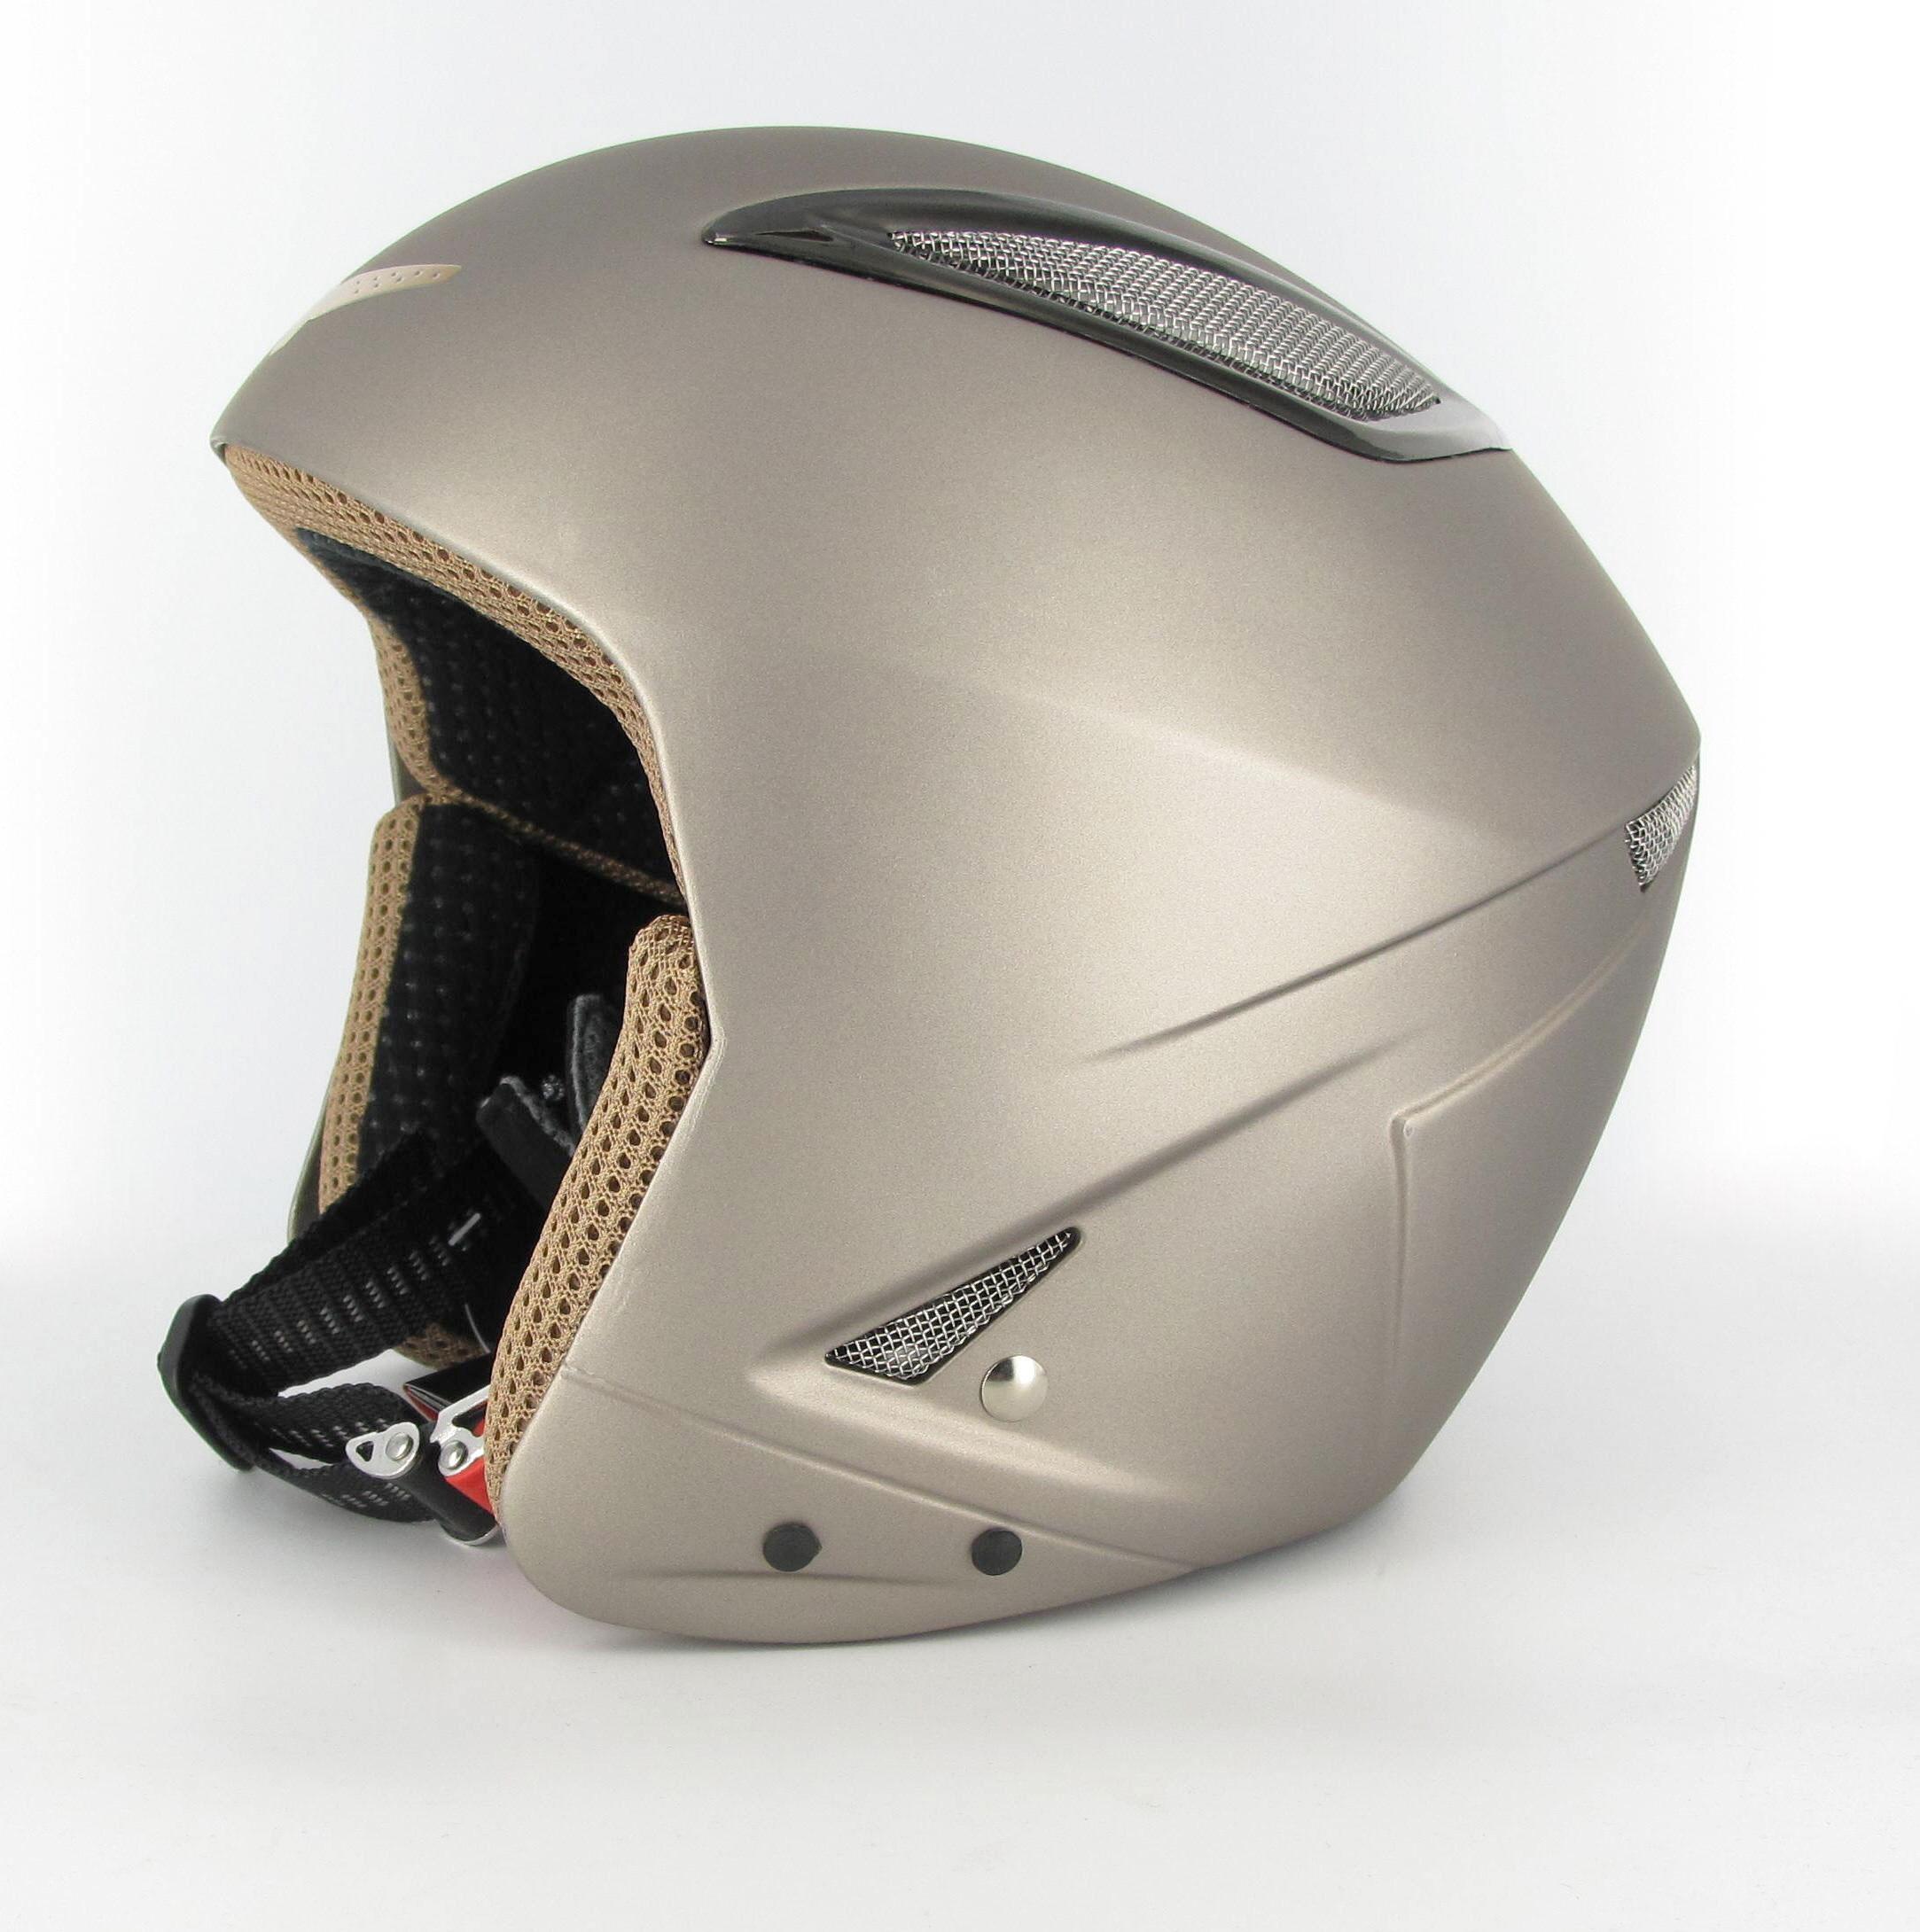 Briko Indian Ski Helmet (Titanium, 56cm) by SOGEN SPORTS INC.